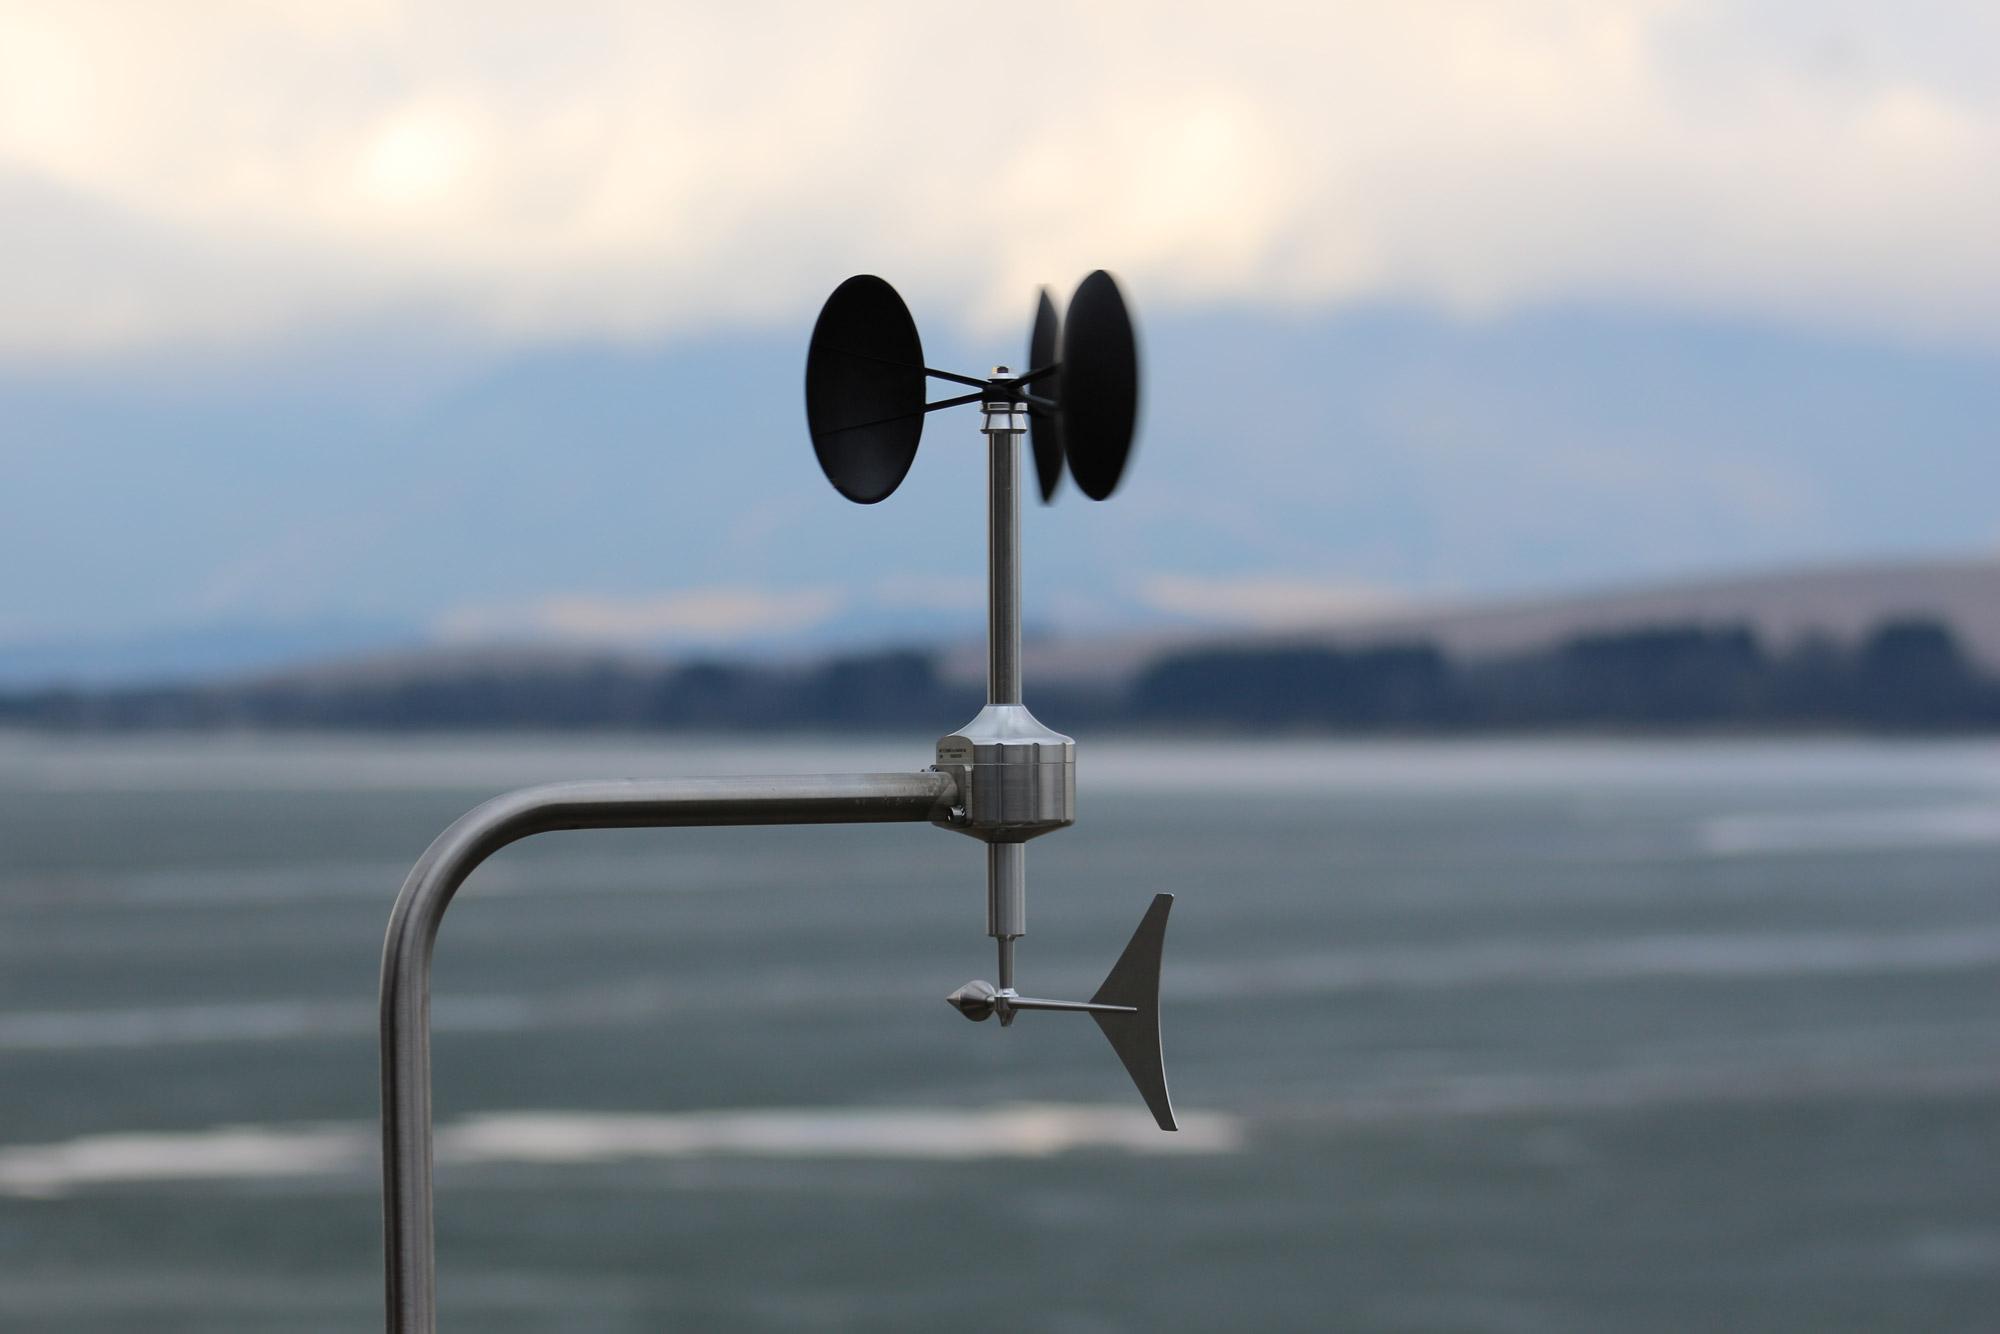 Anemometer on a coastline